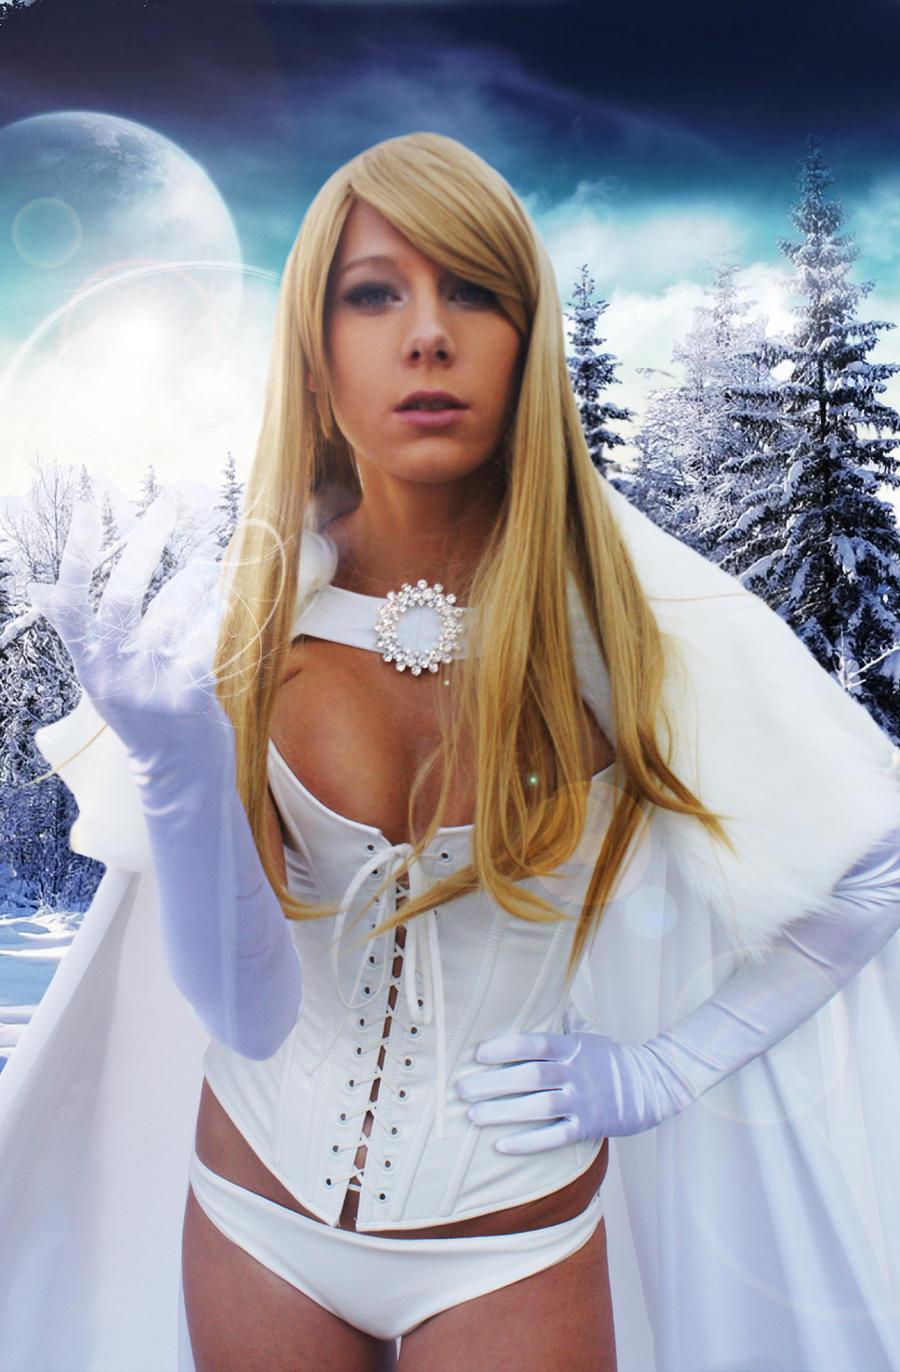 Emma Frost by ConstantineInTokyo